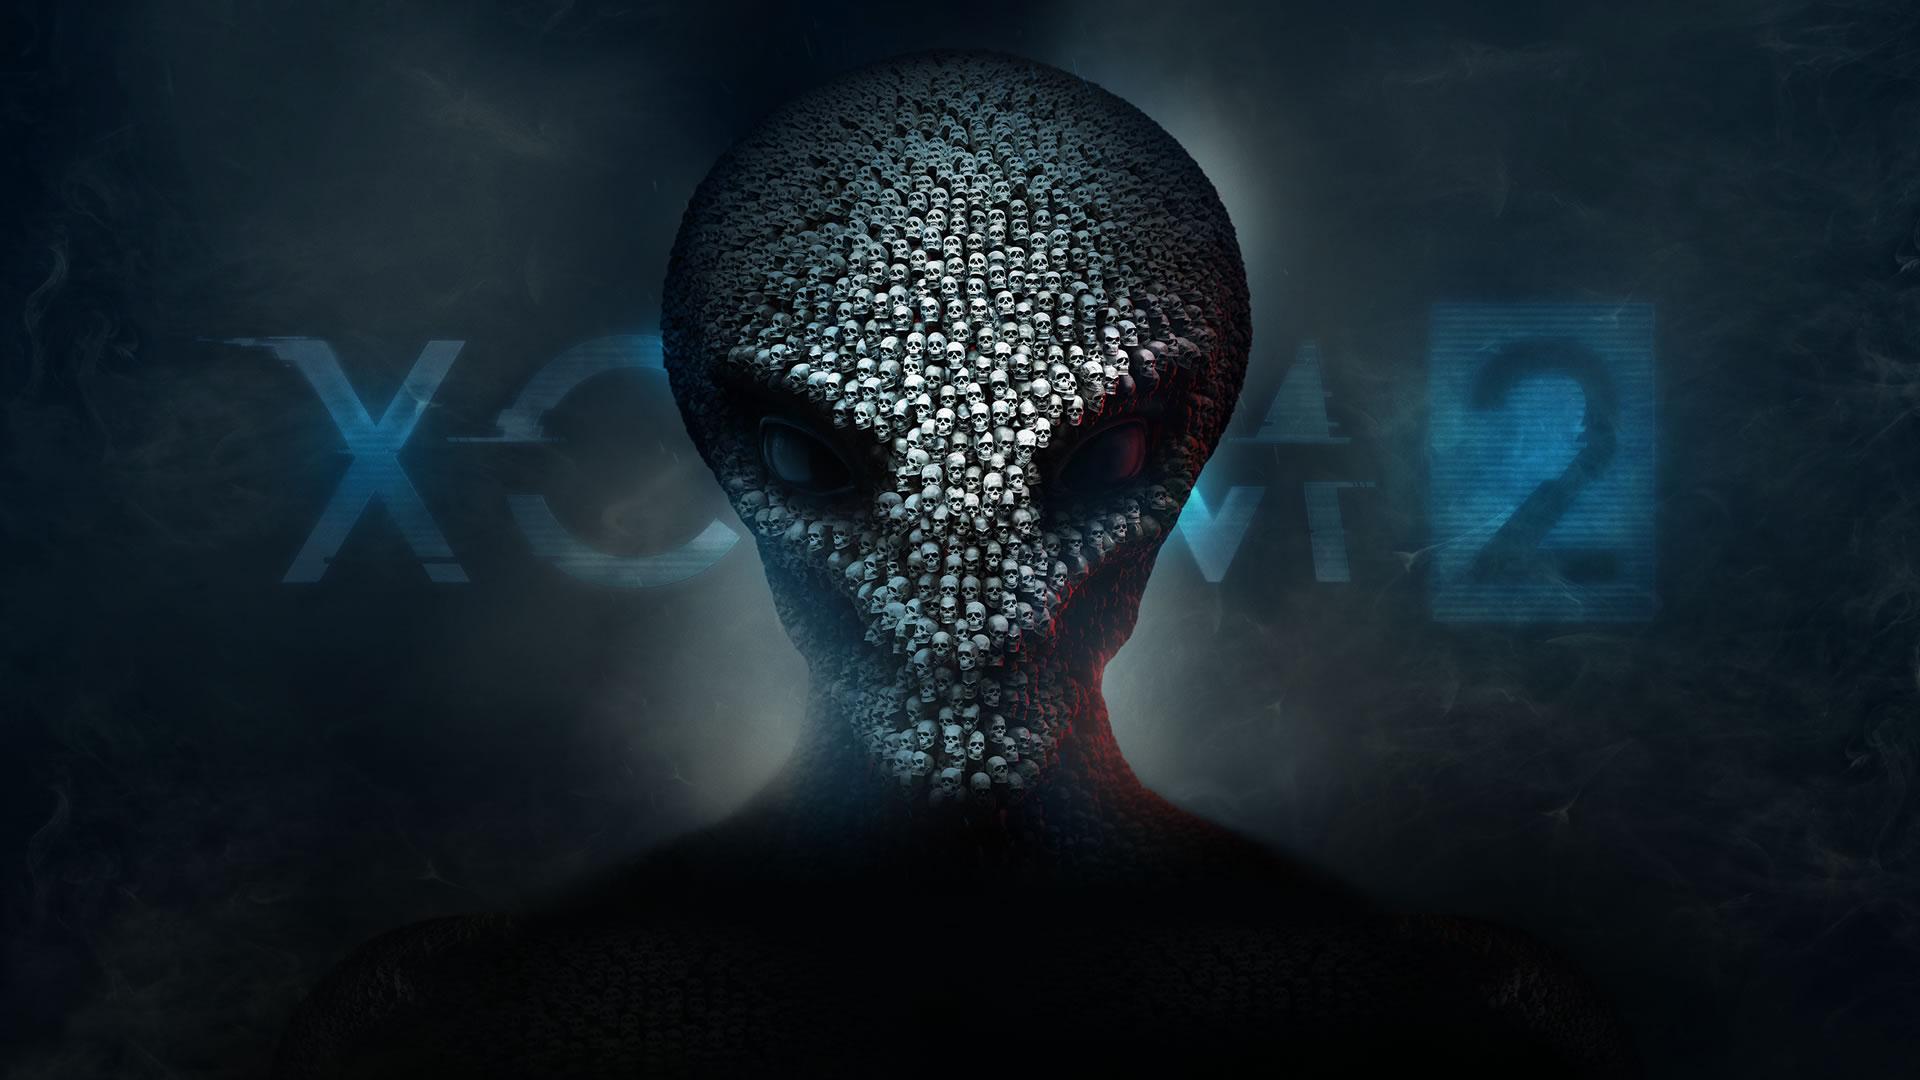 XCOM 2 Wallpapers hd